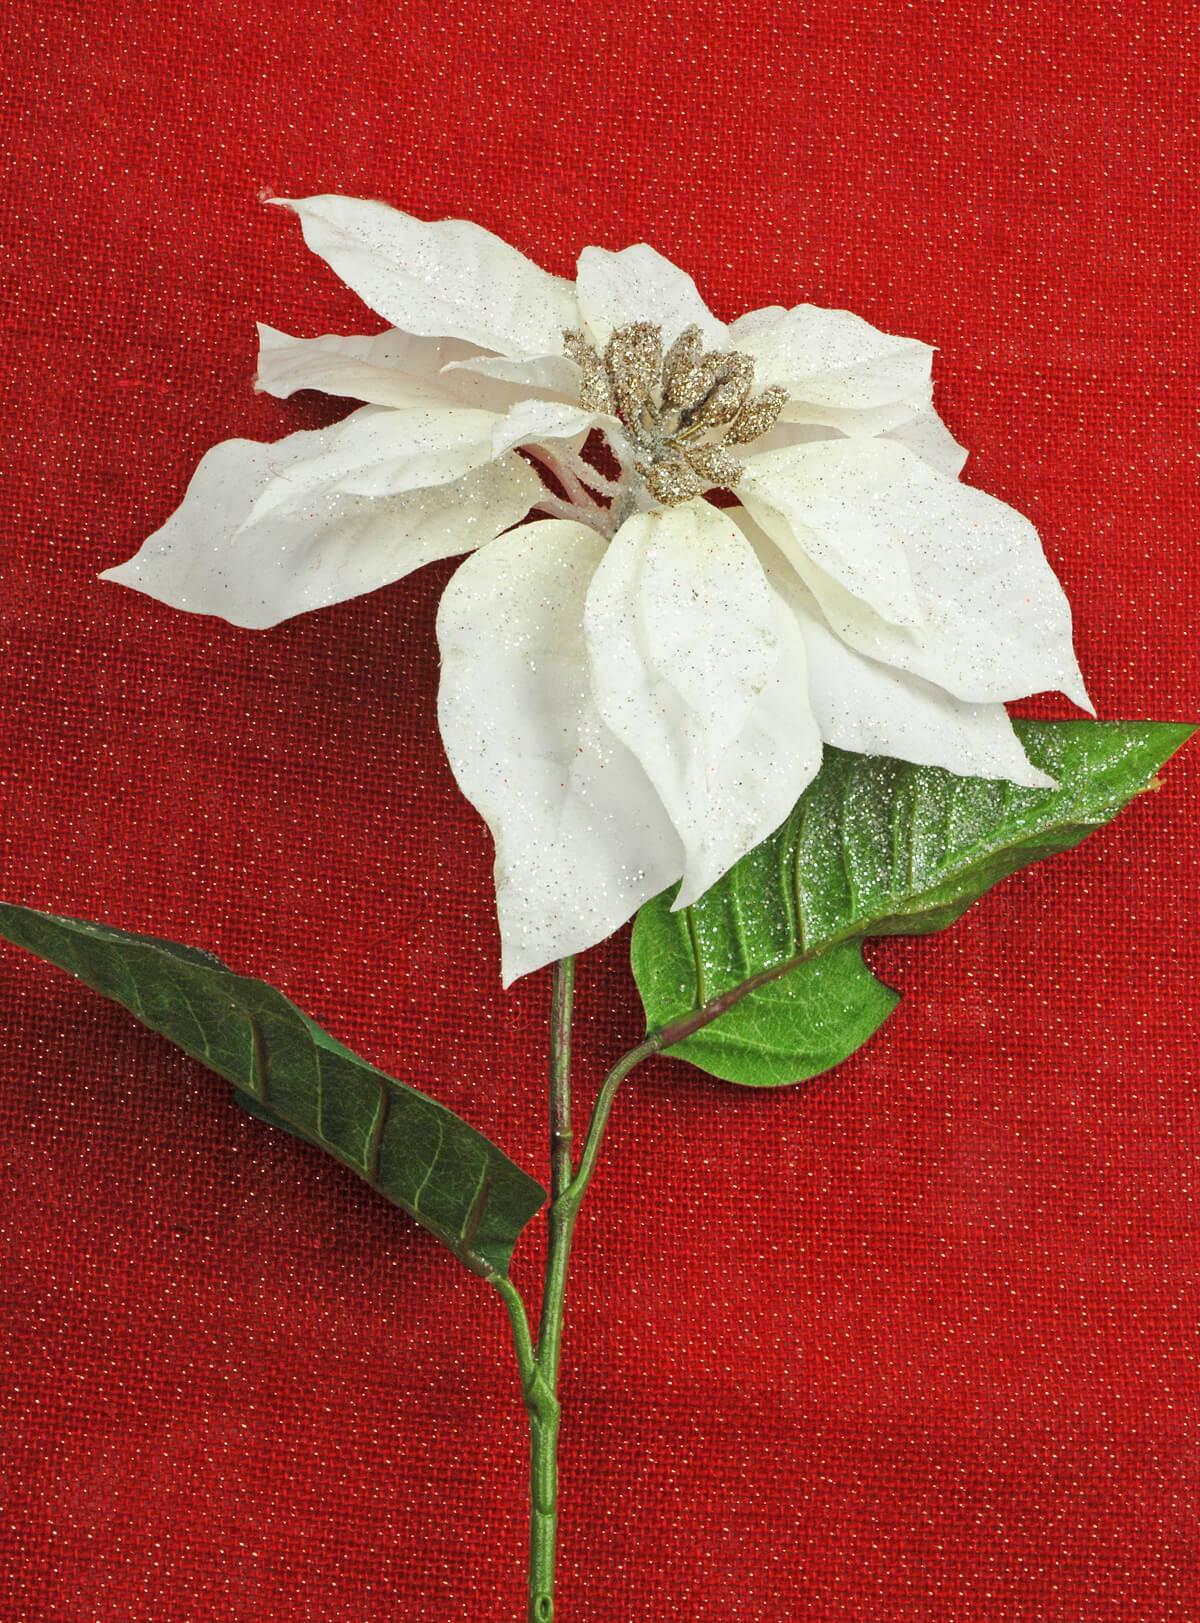 White Poinsettia Flower With Glitter